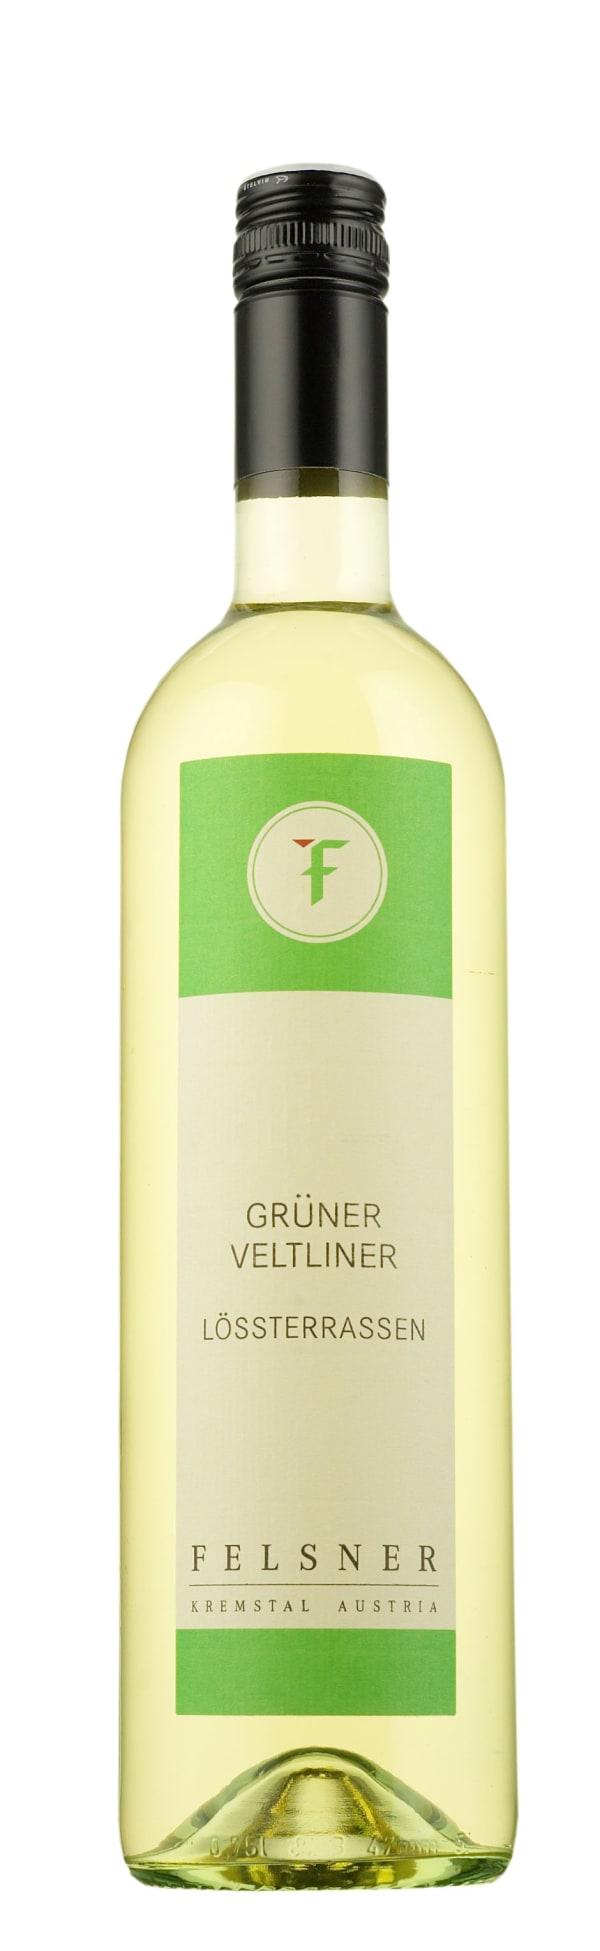 Felsner Lössterrassen Grüner Veltliner 2016